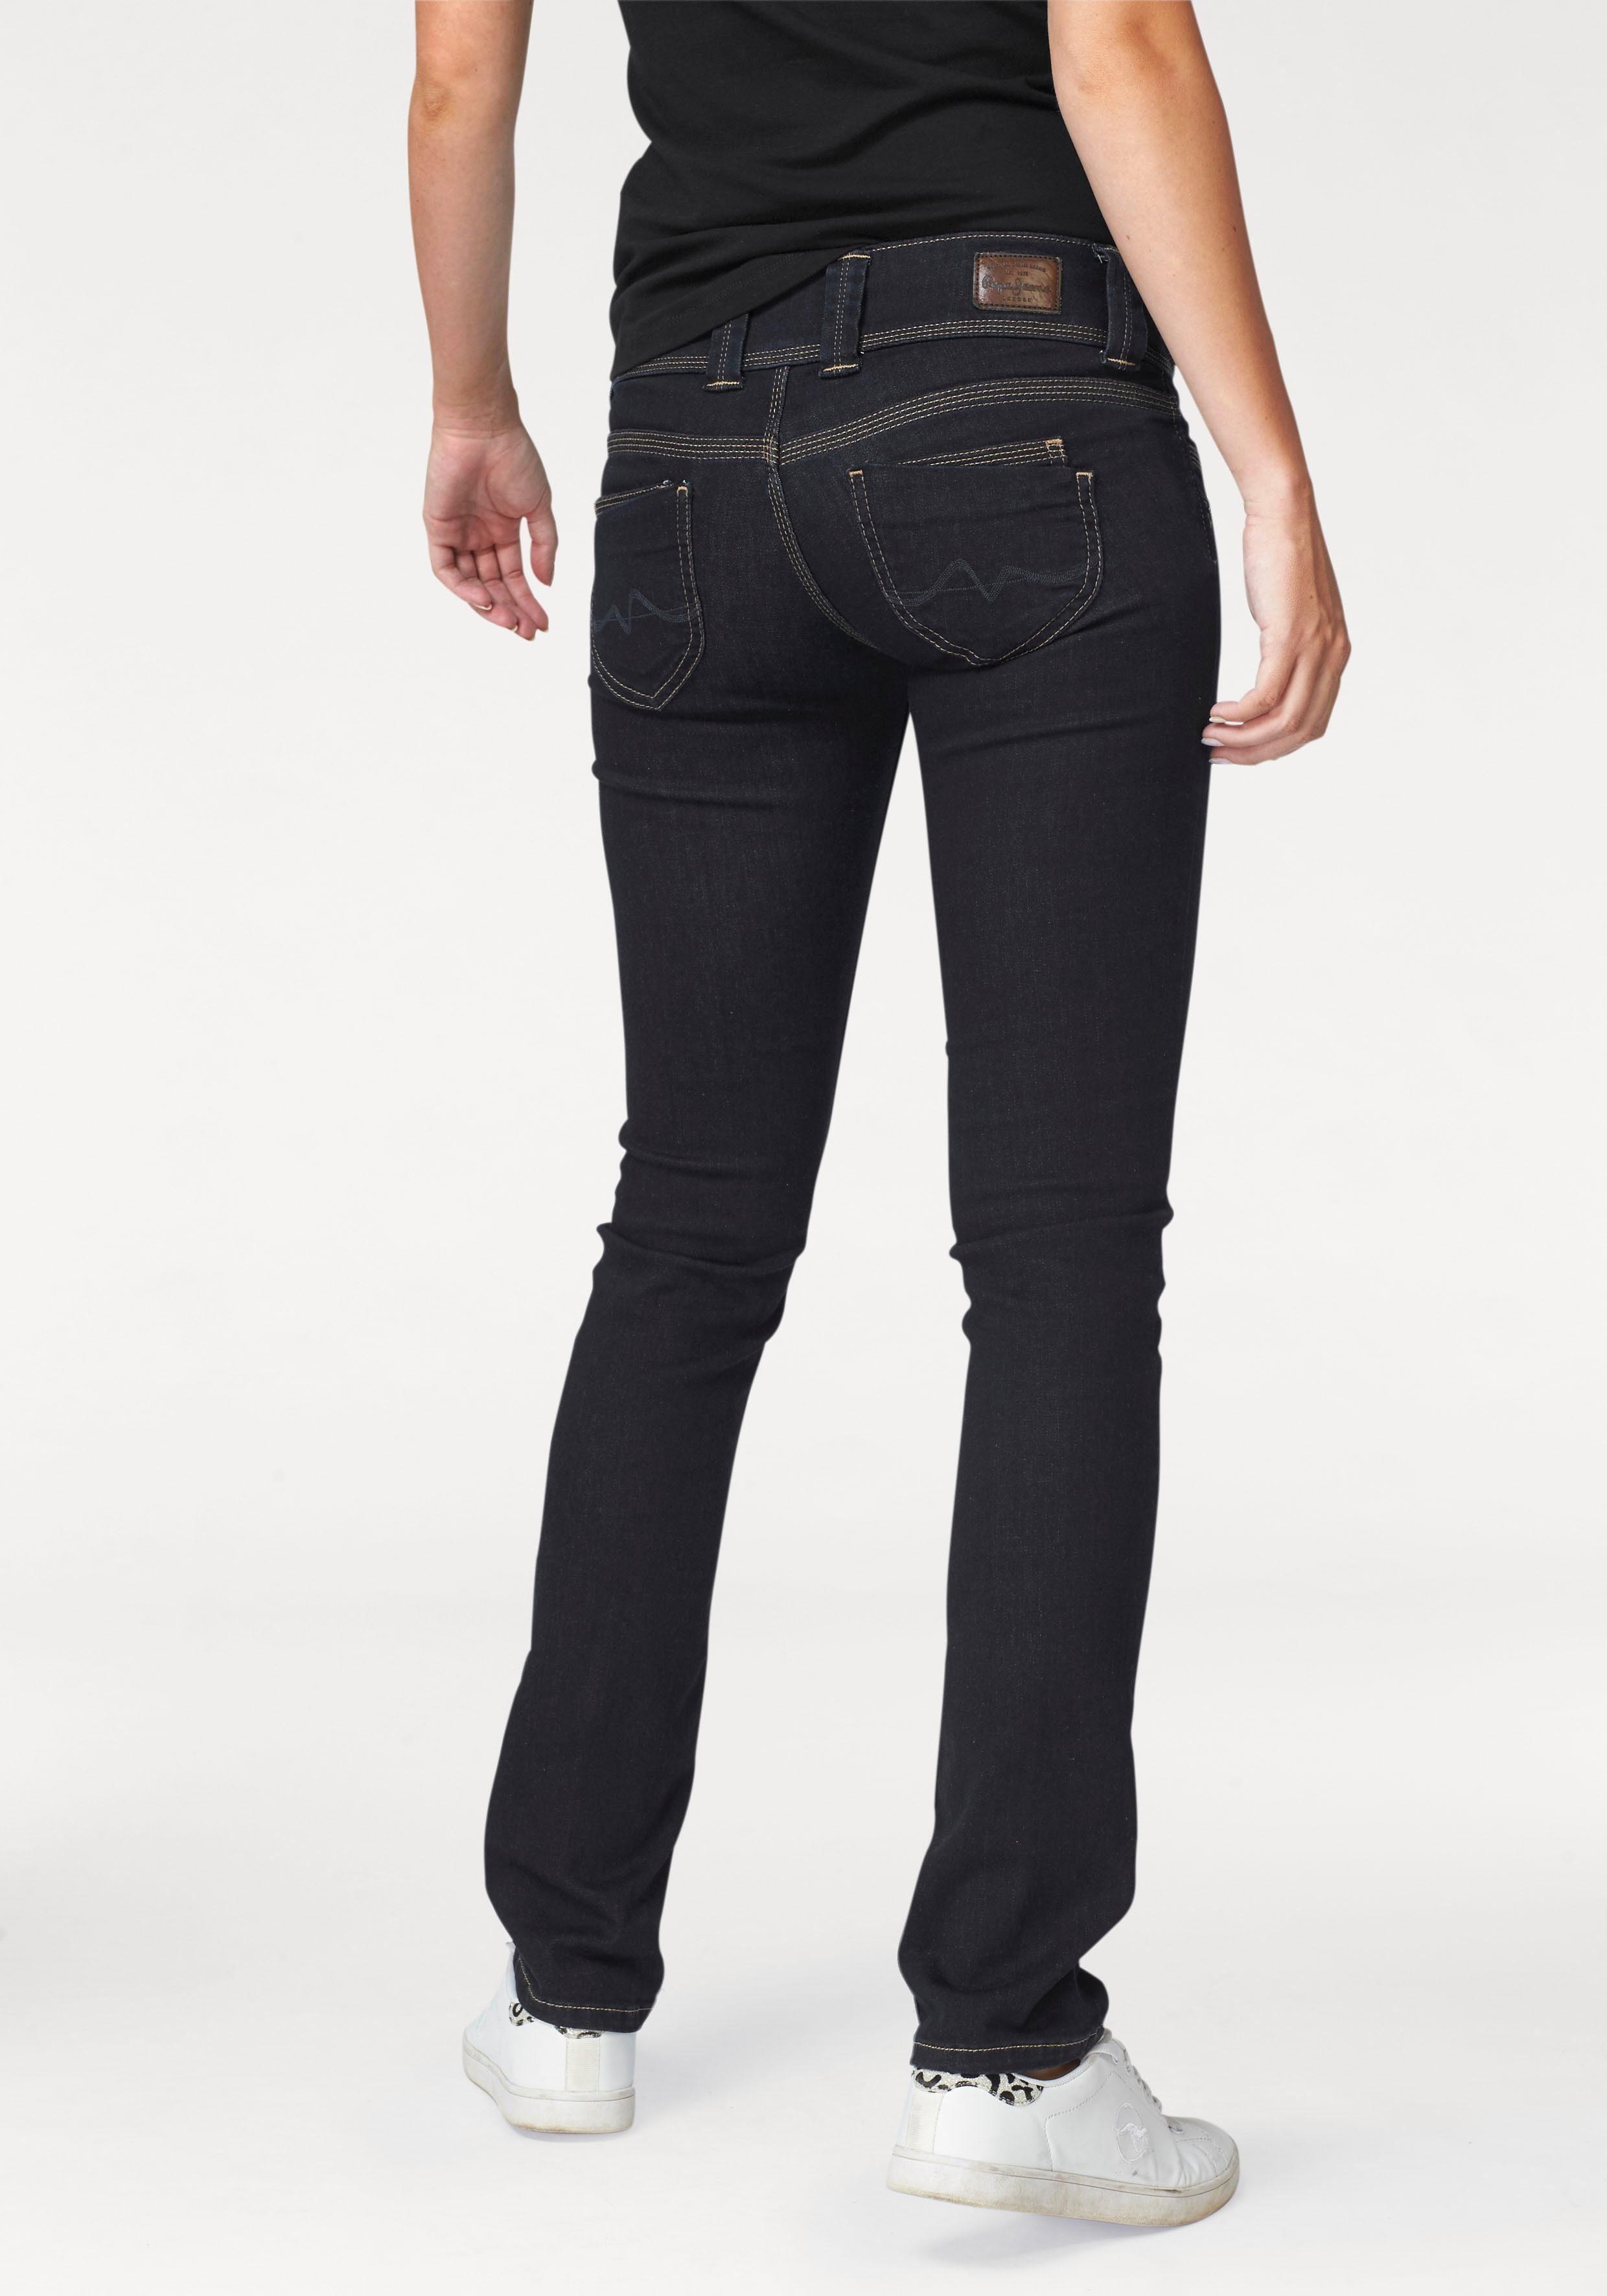 Pepe Jeans Straight-Jeans »VENUS« mit breitem 2-Knopf-Bund